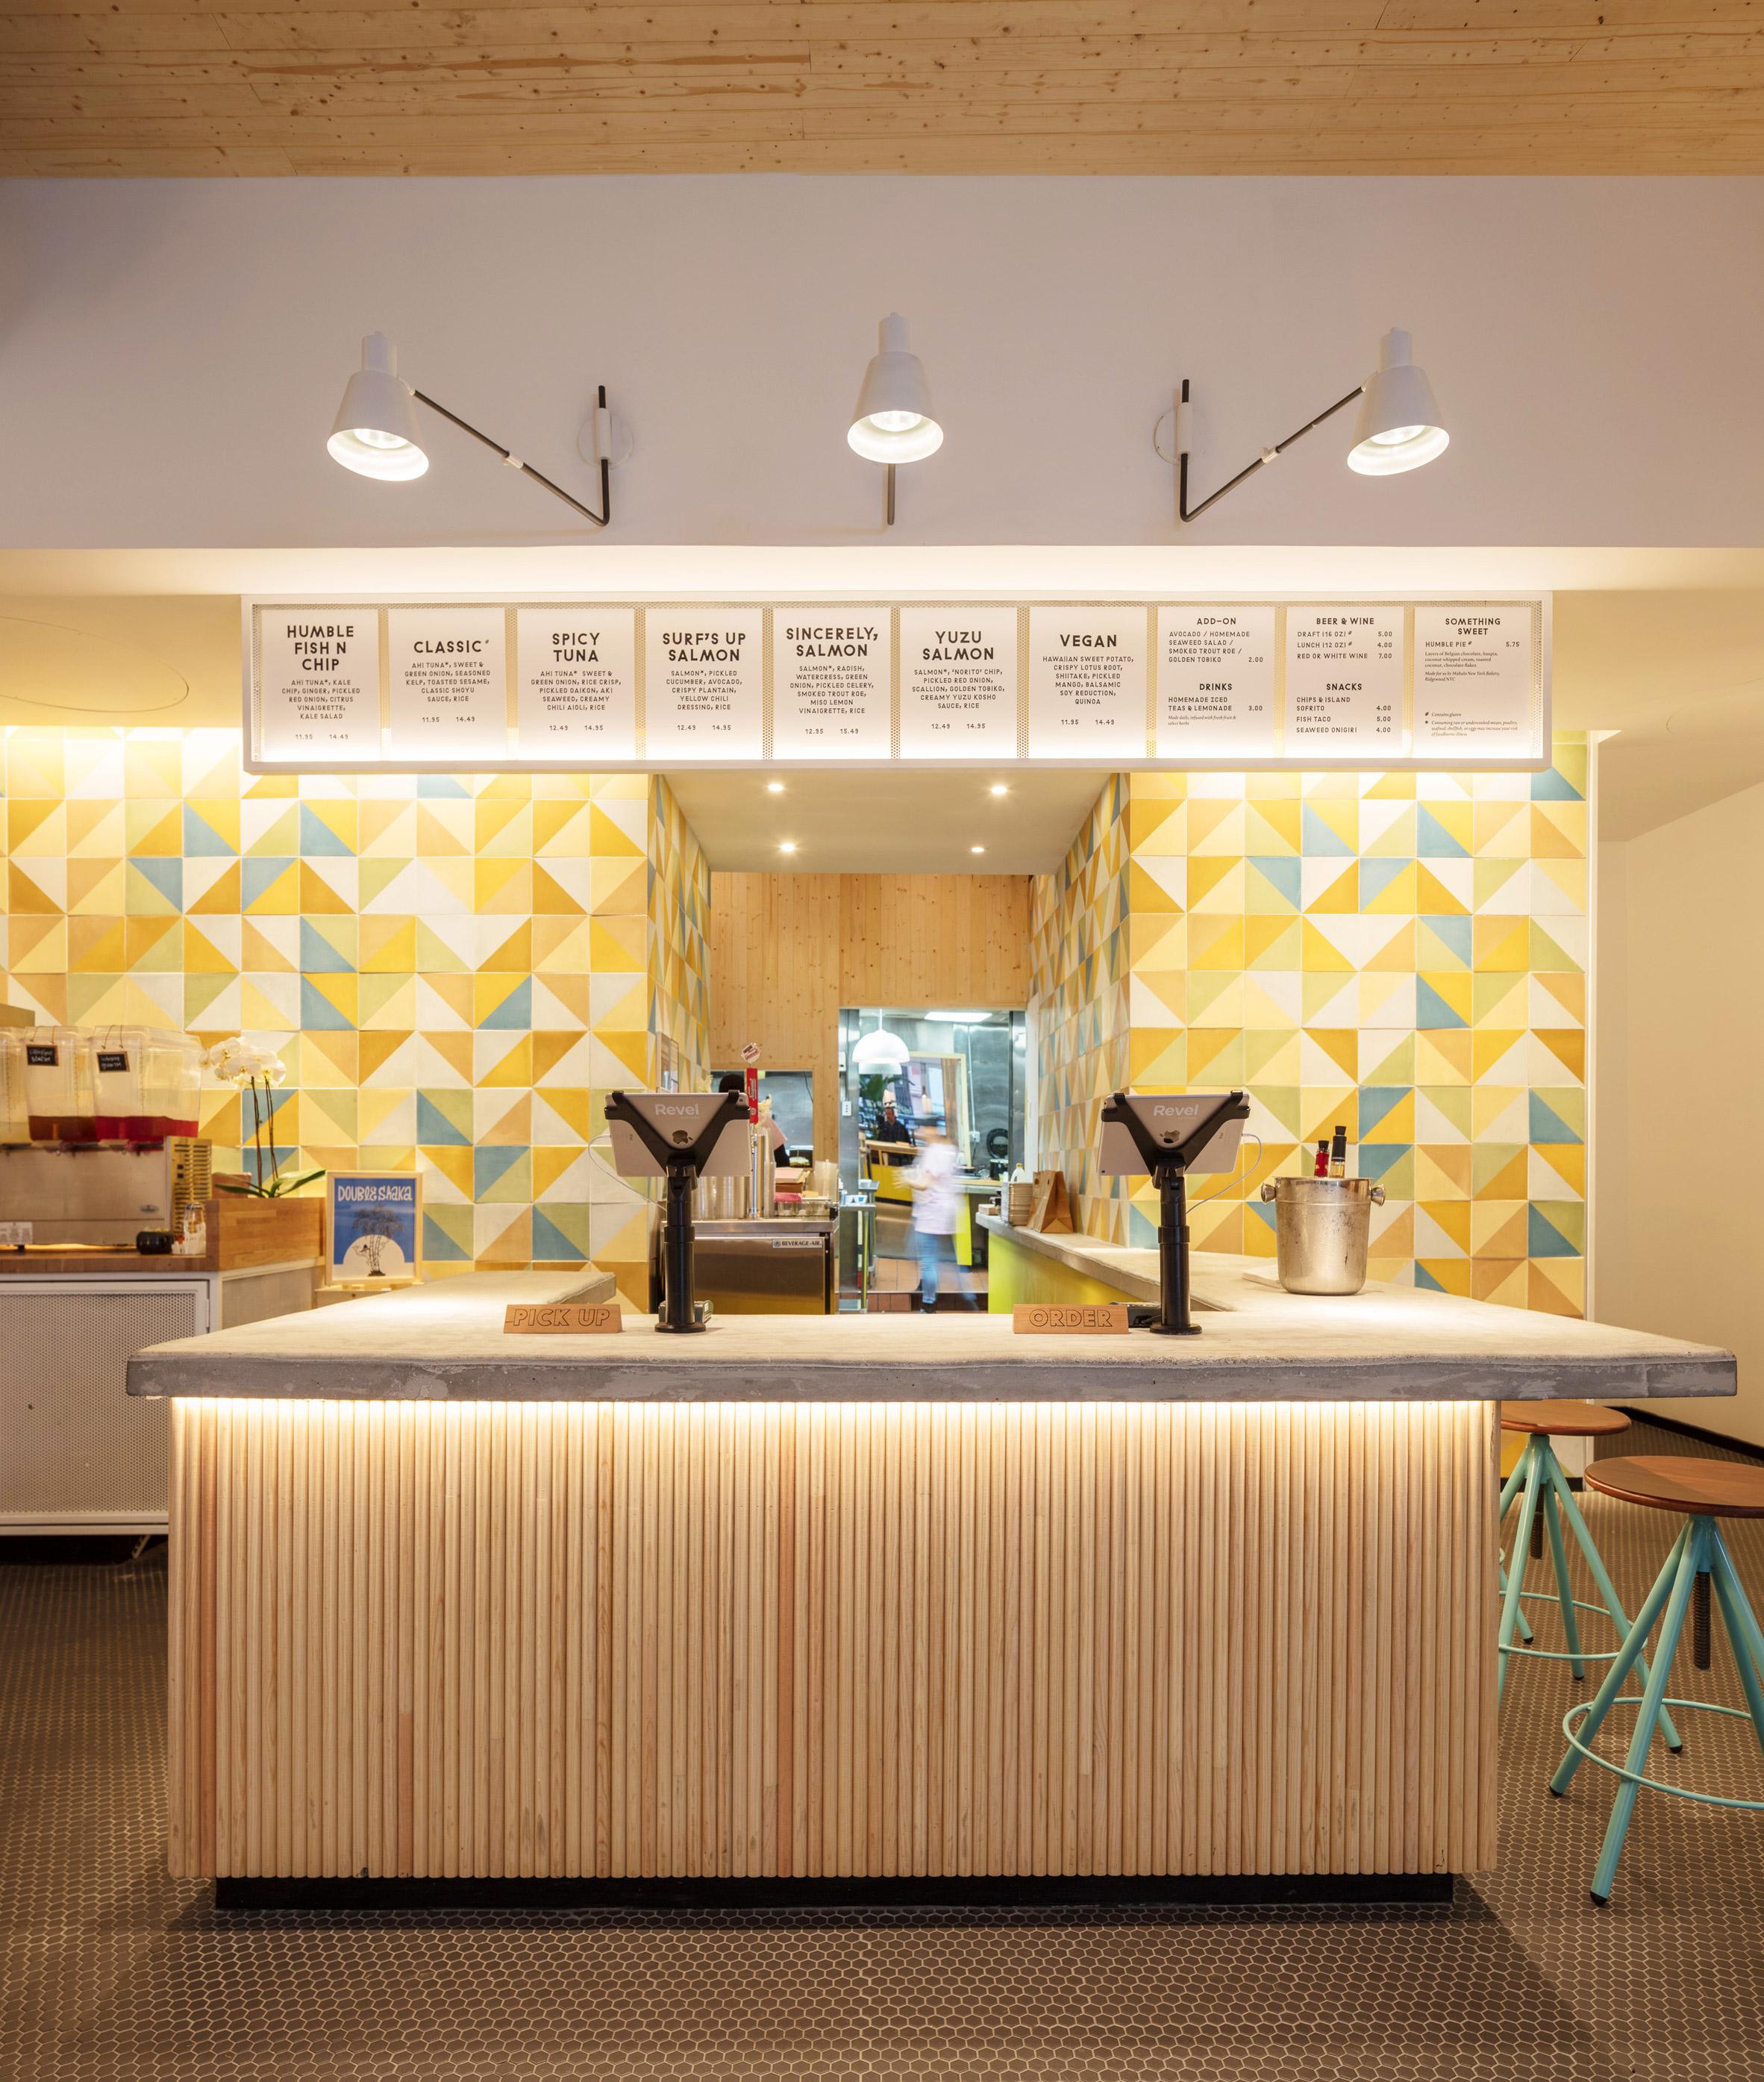 humblefish-poke-restaurant-architecture-outfit-tribeca-new-york_dezainaa.jpg